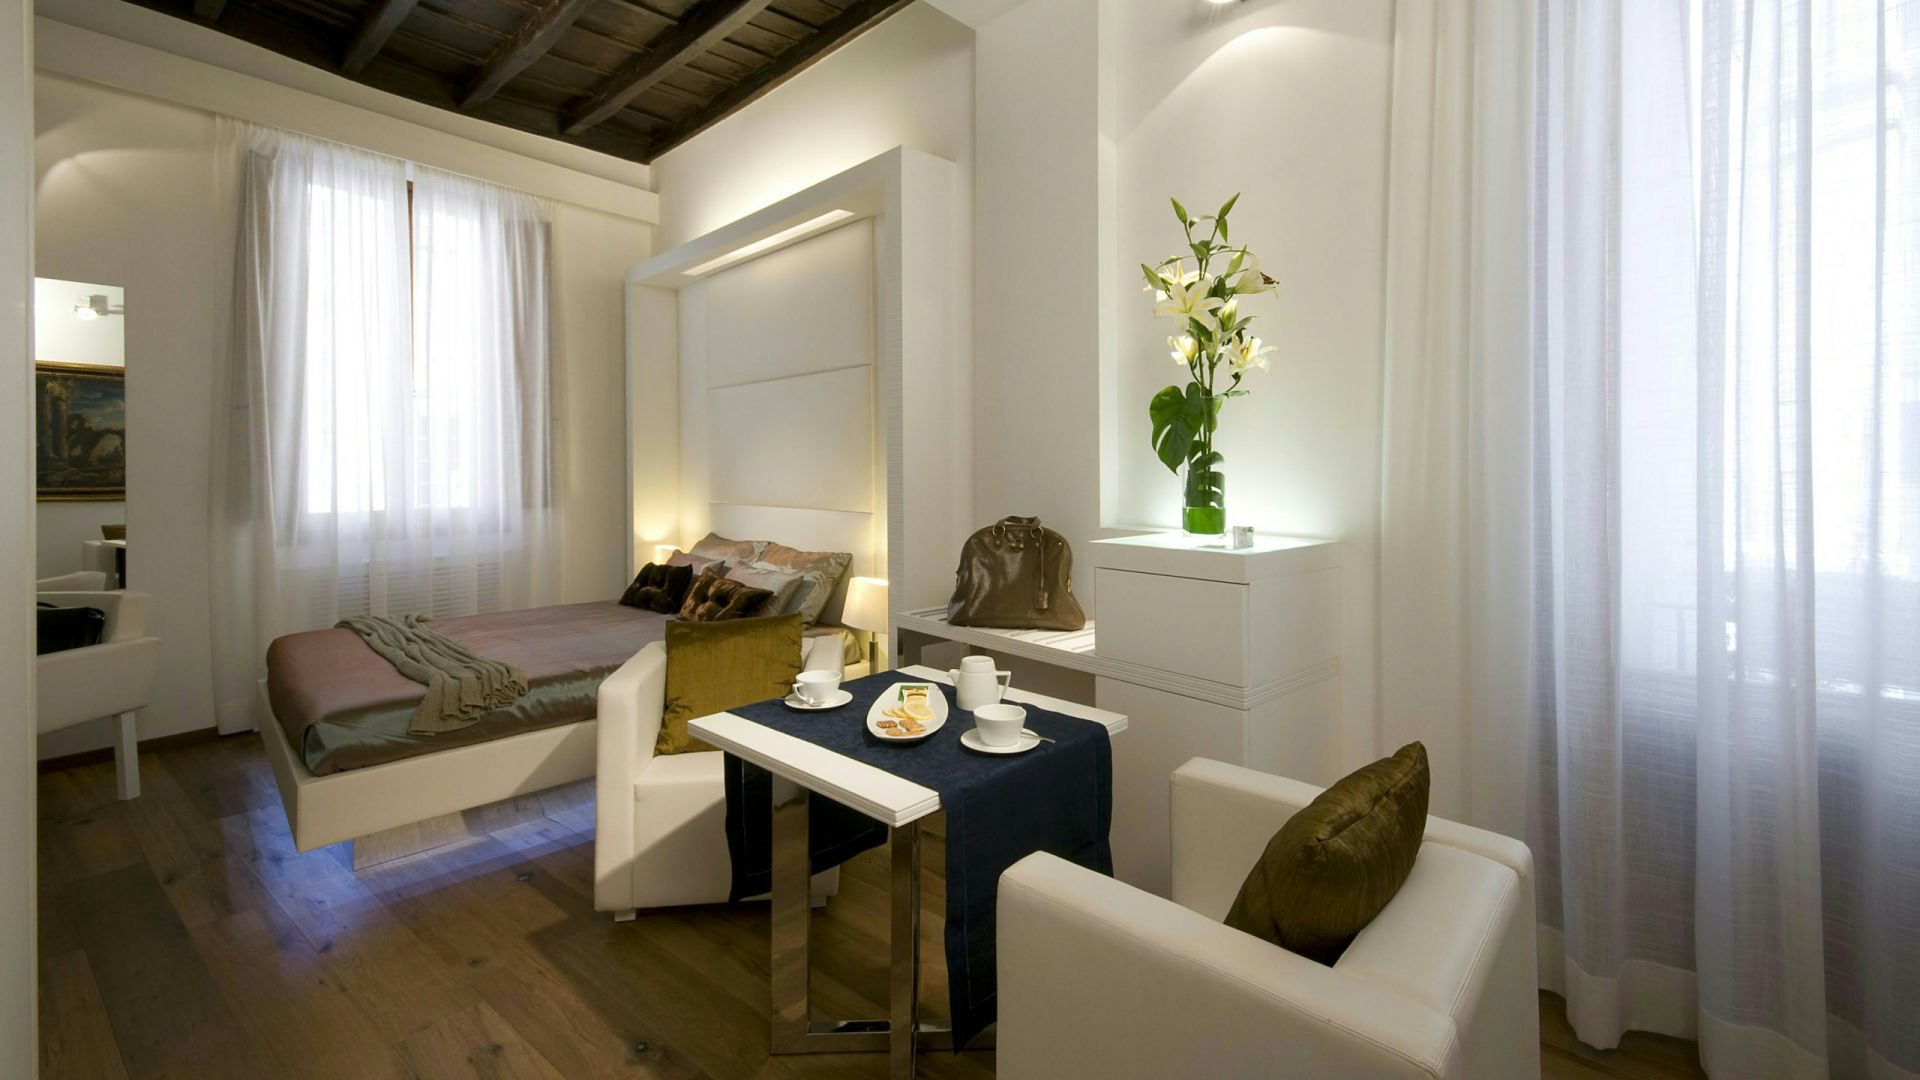 gigli-d-oro-suite-roma-suite-classic-6